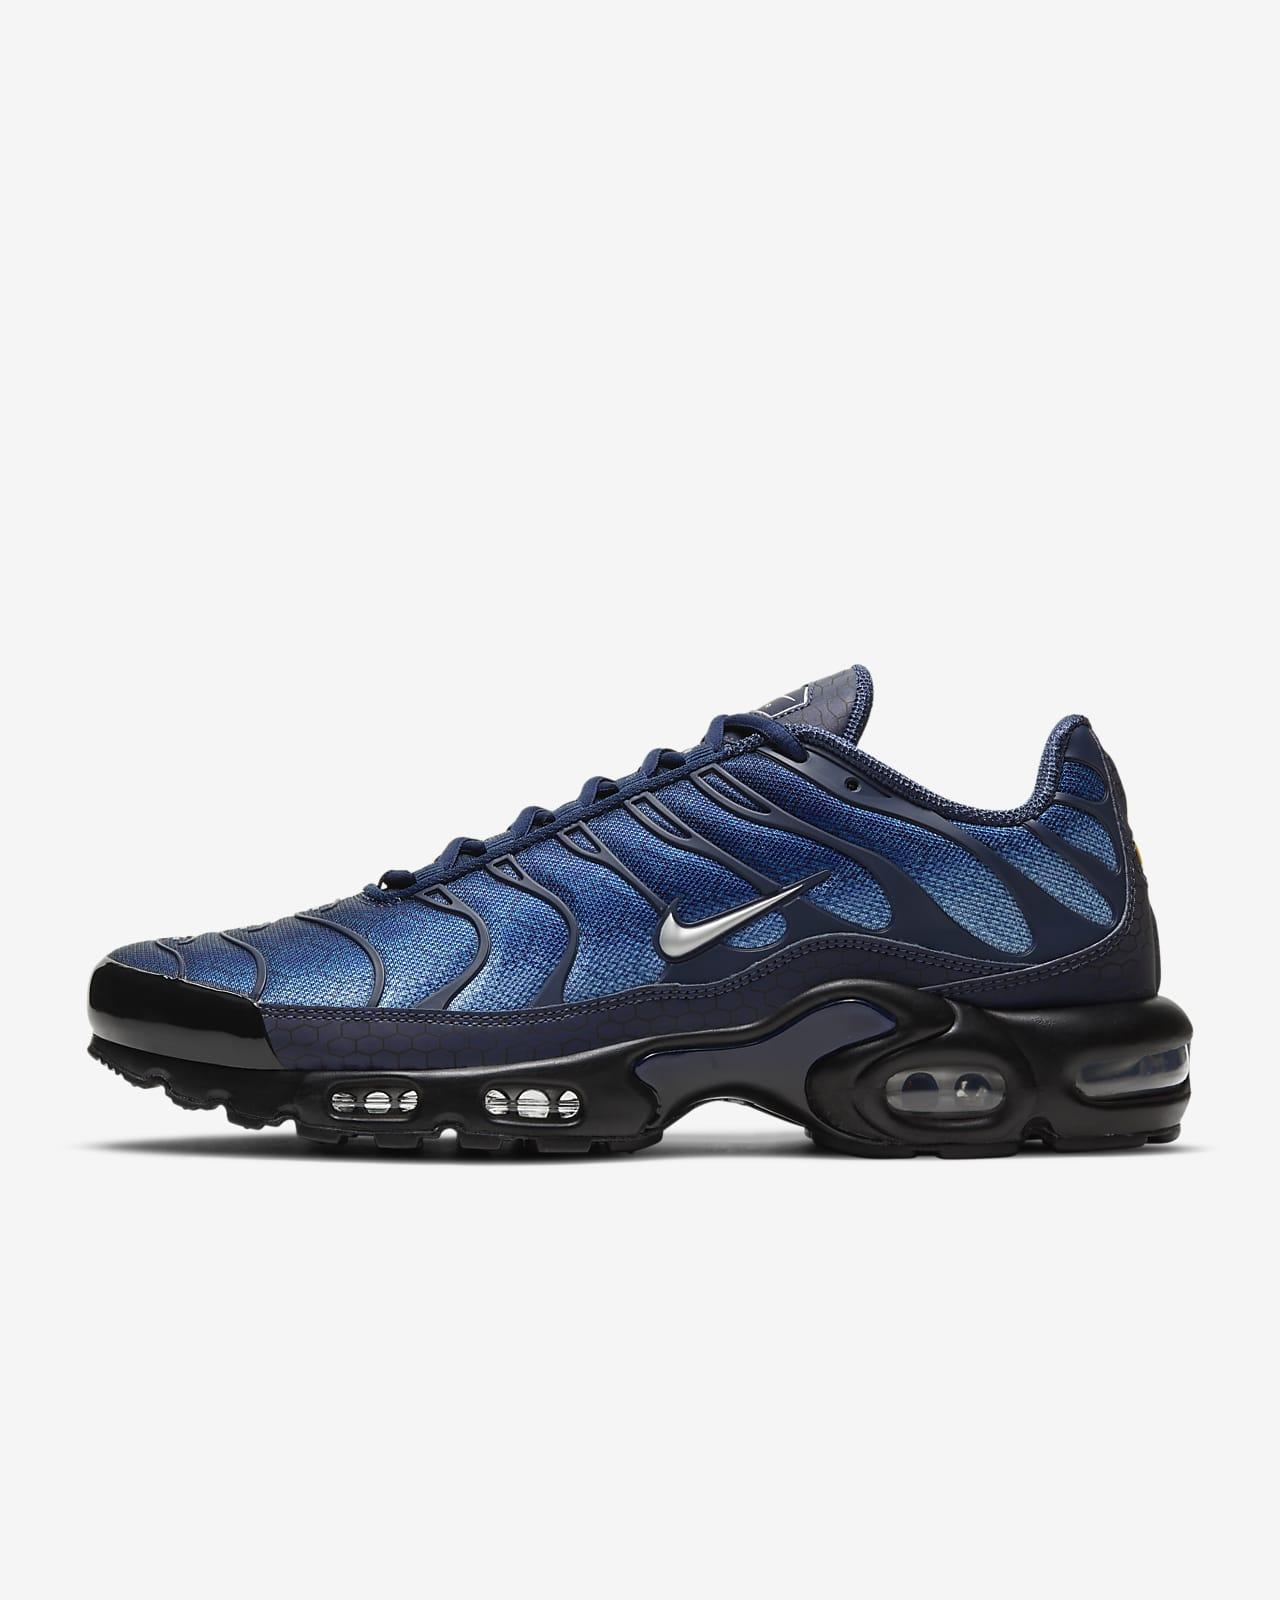 chaussures nike homme bleu